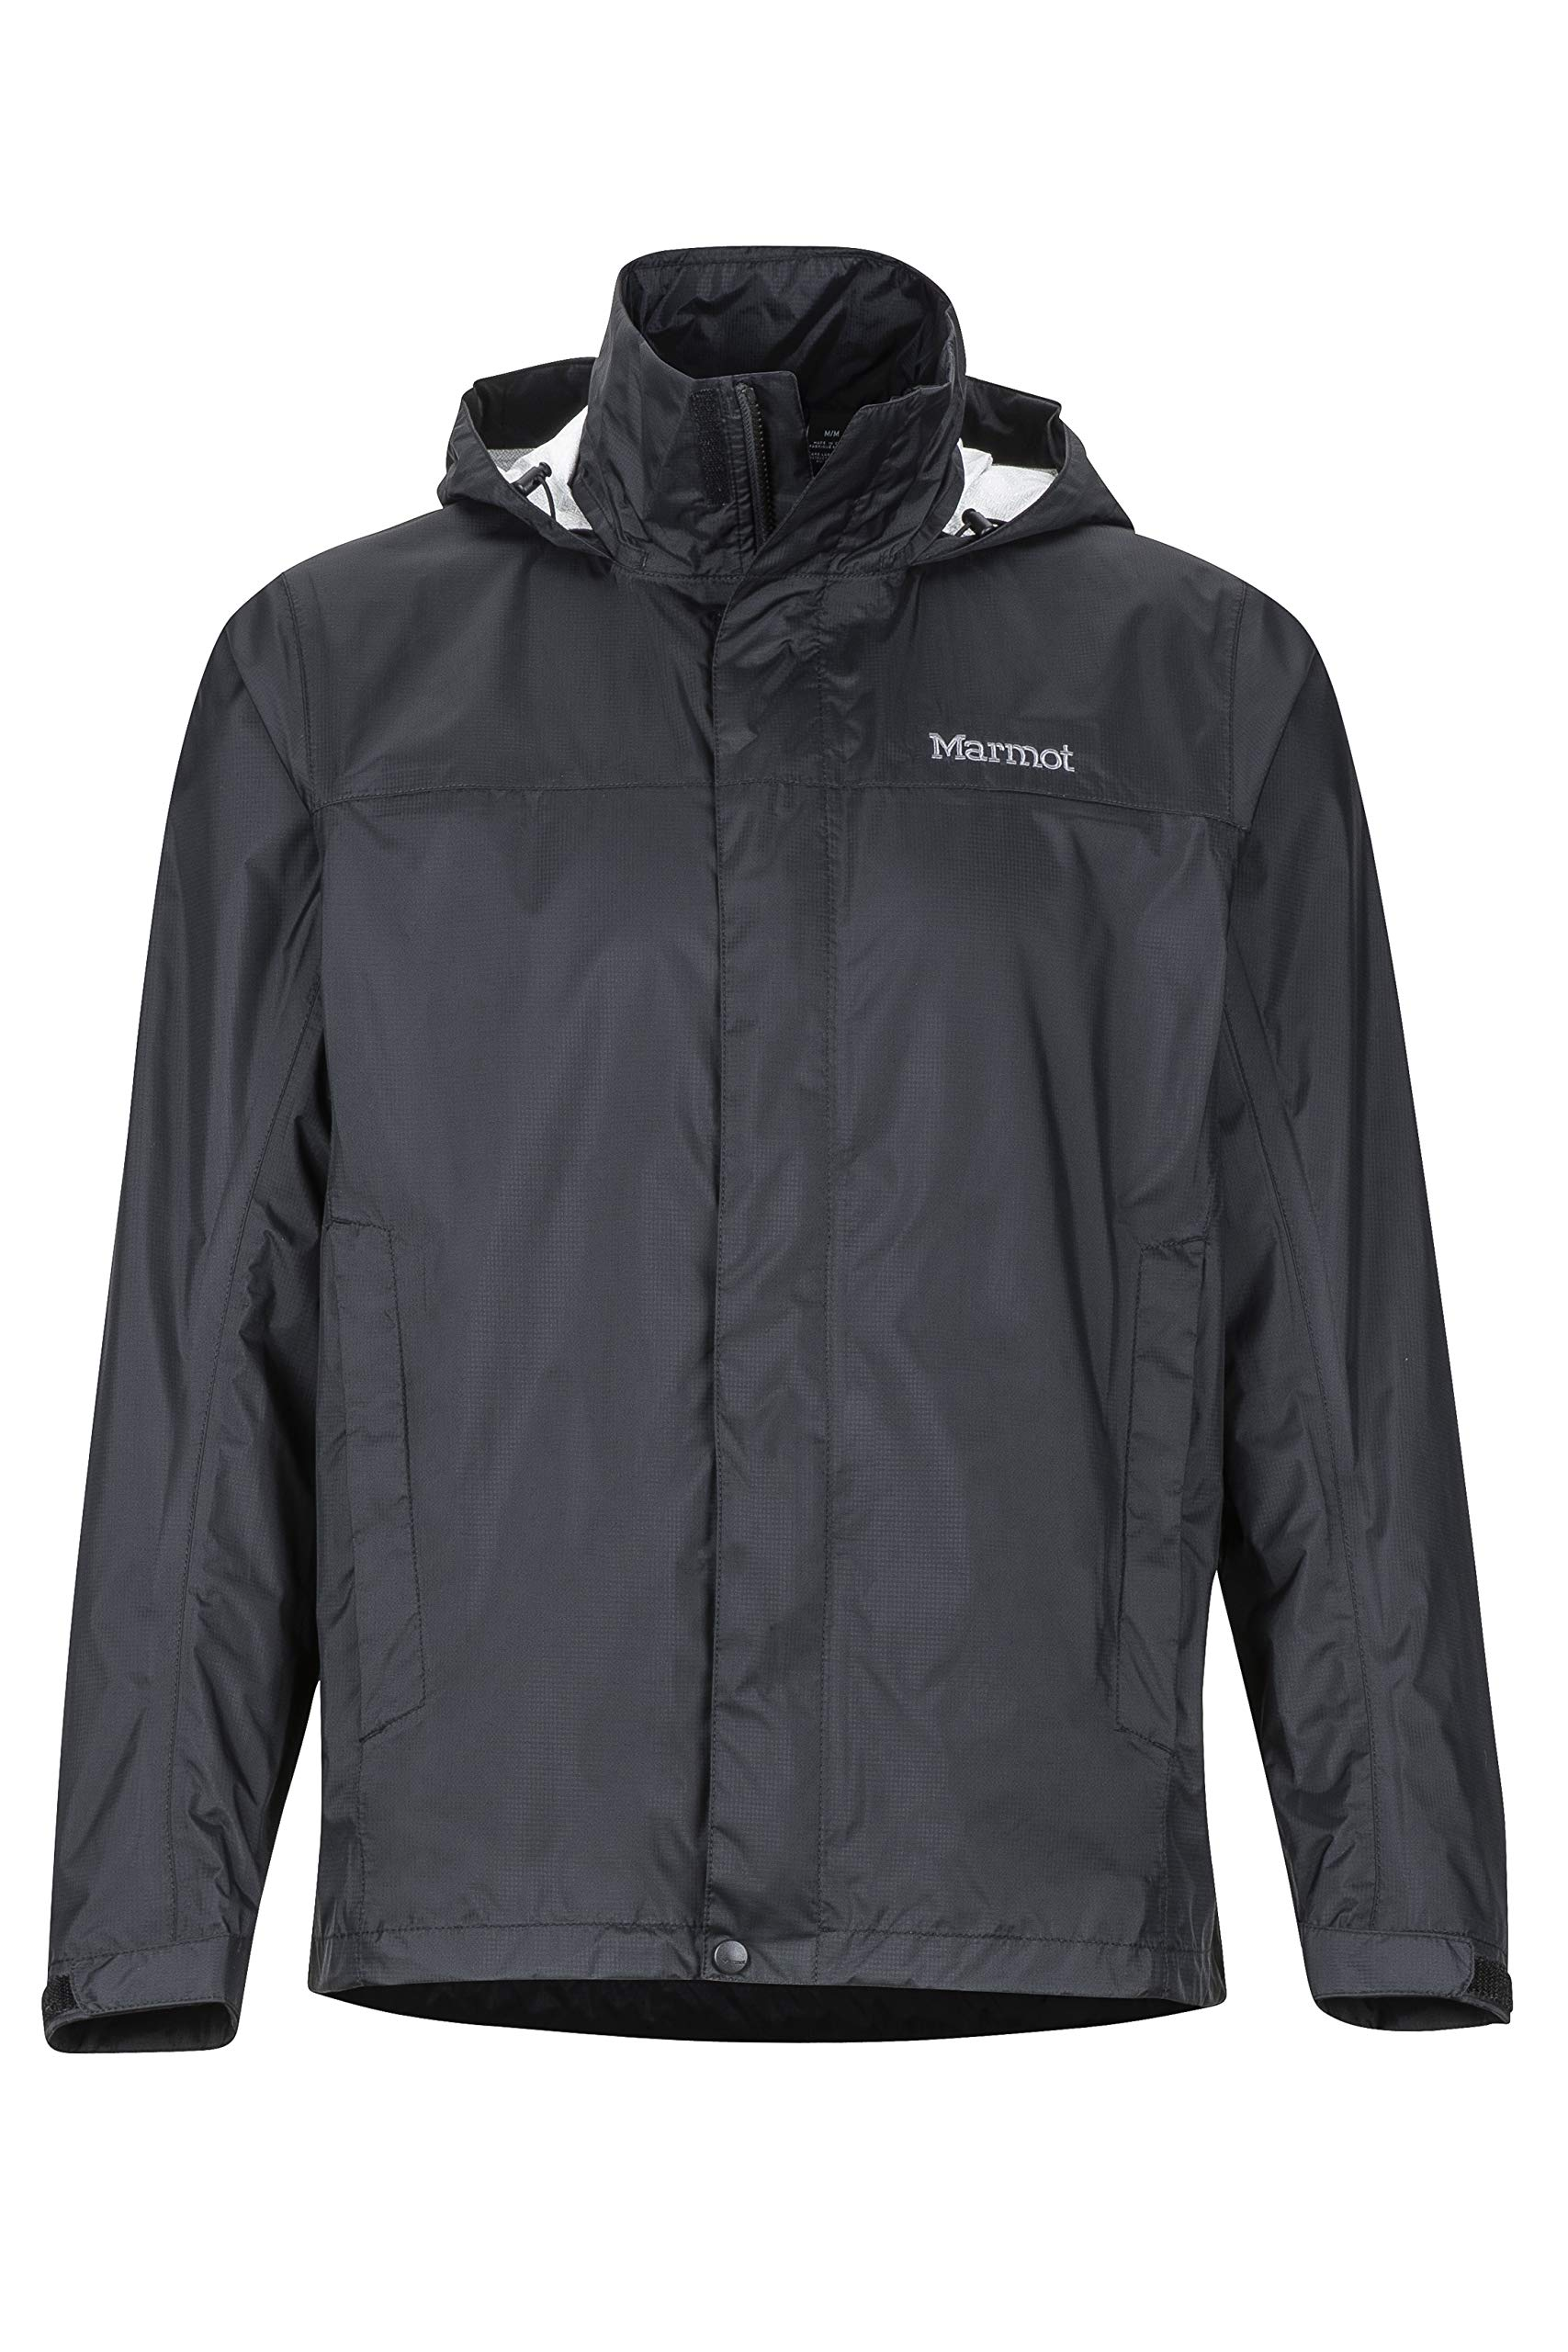 Marmot Men's Precip Jacket, Black, 3X-Large